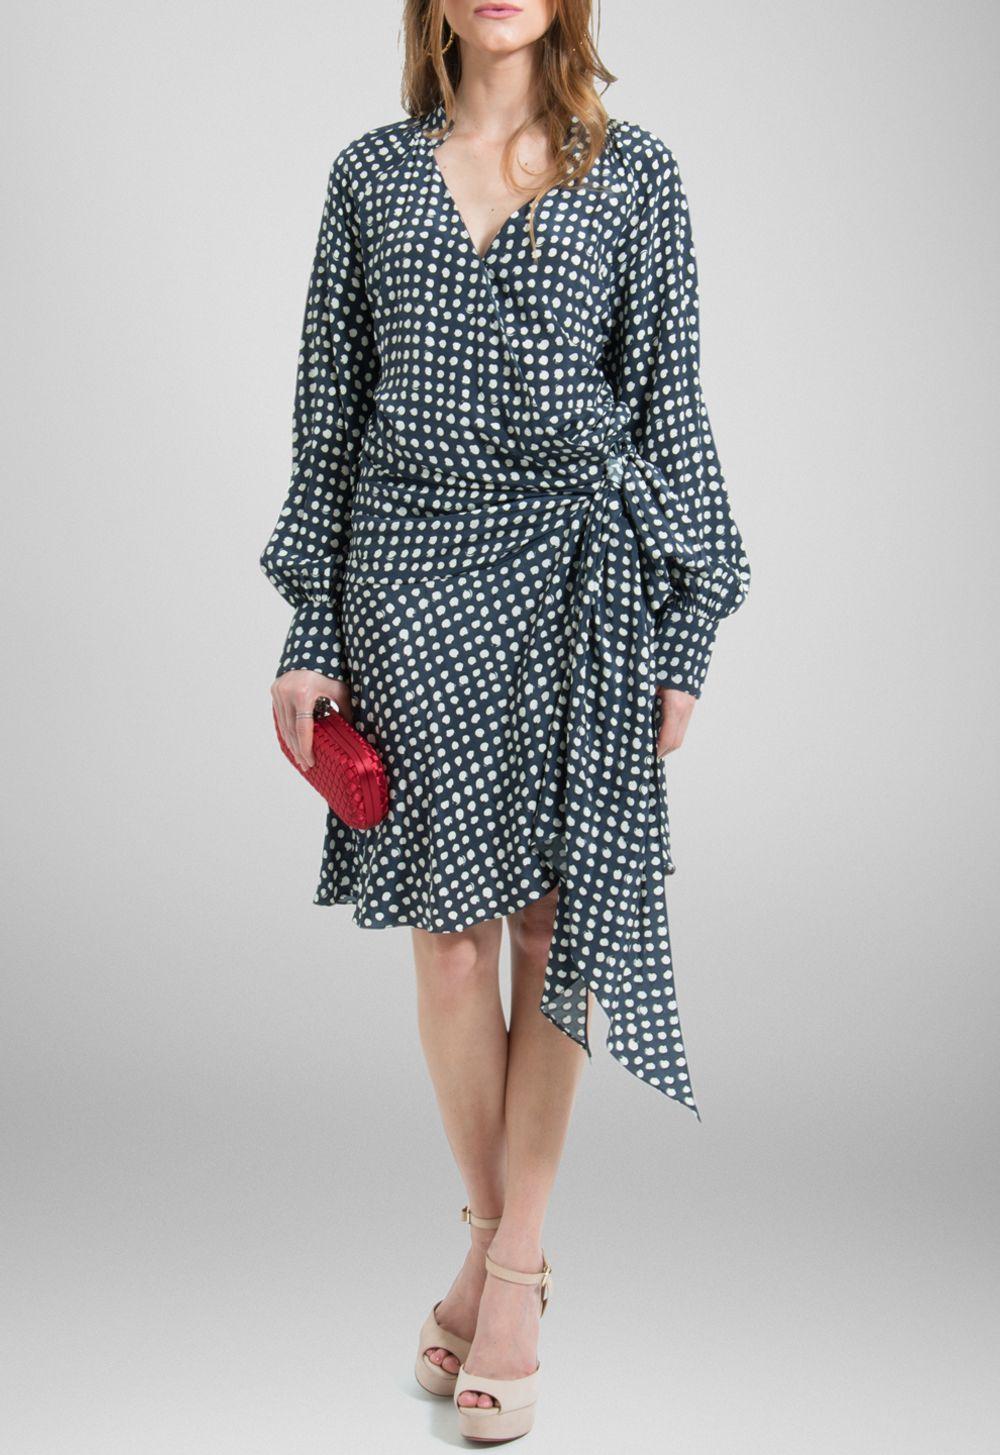 34c760eb8 vestido-olenka-curto-transpassado-de-poa-mixed-estampado ...